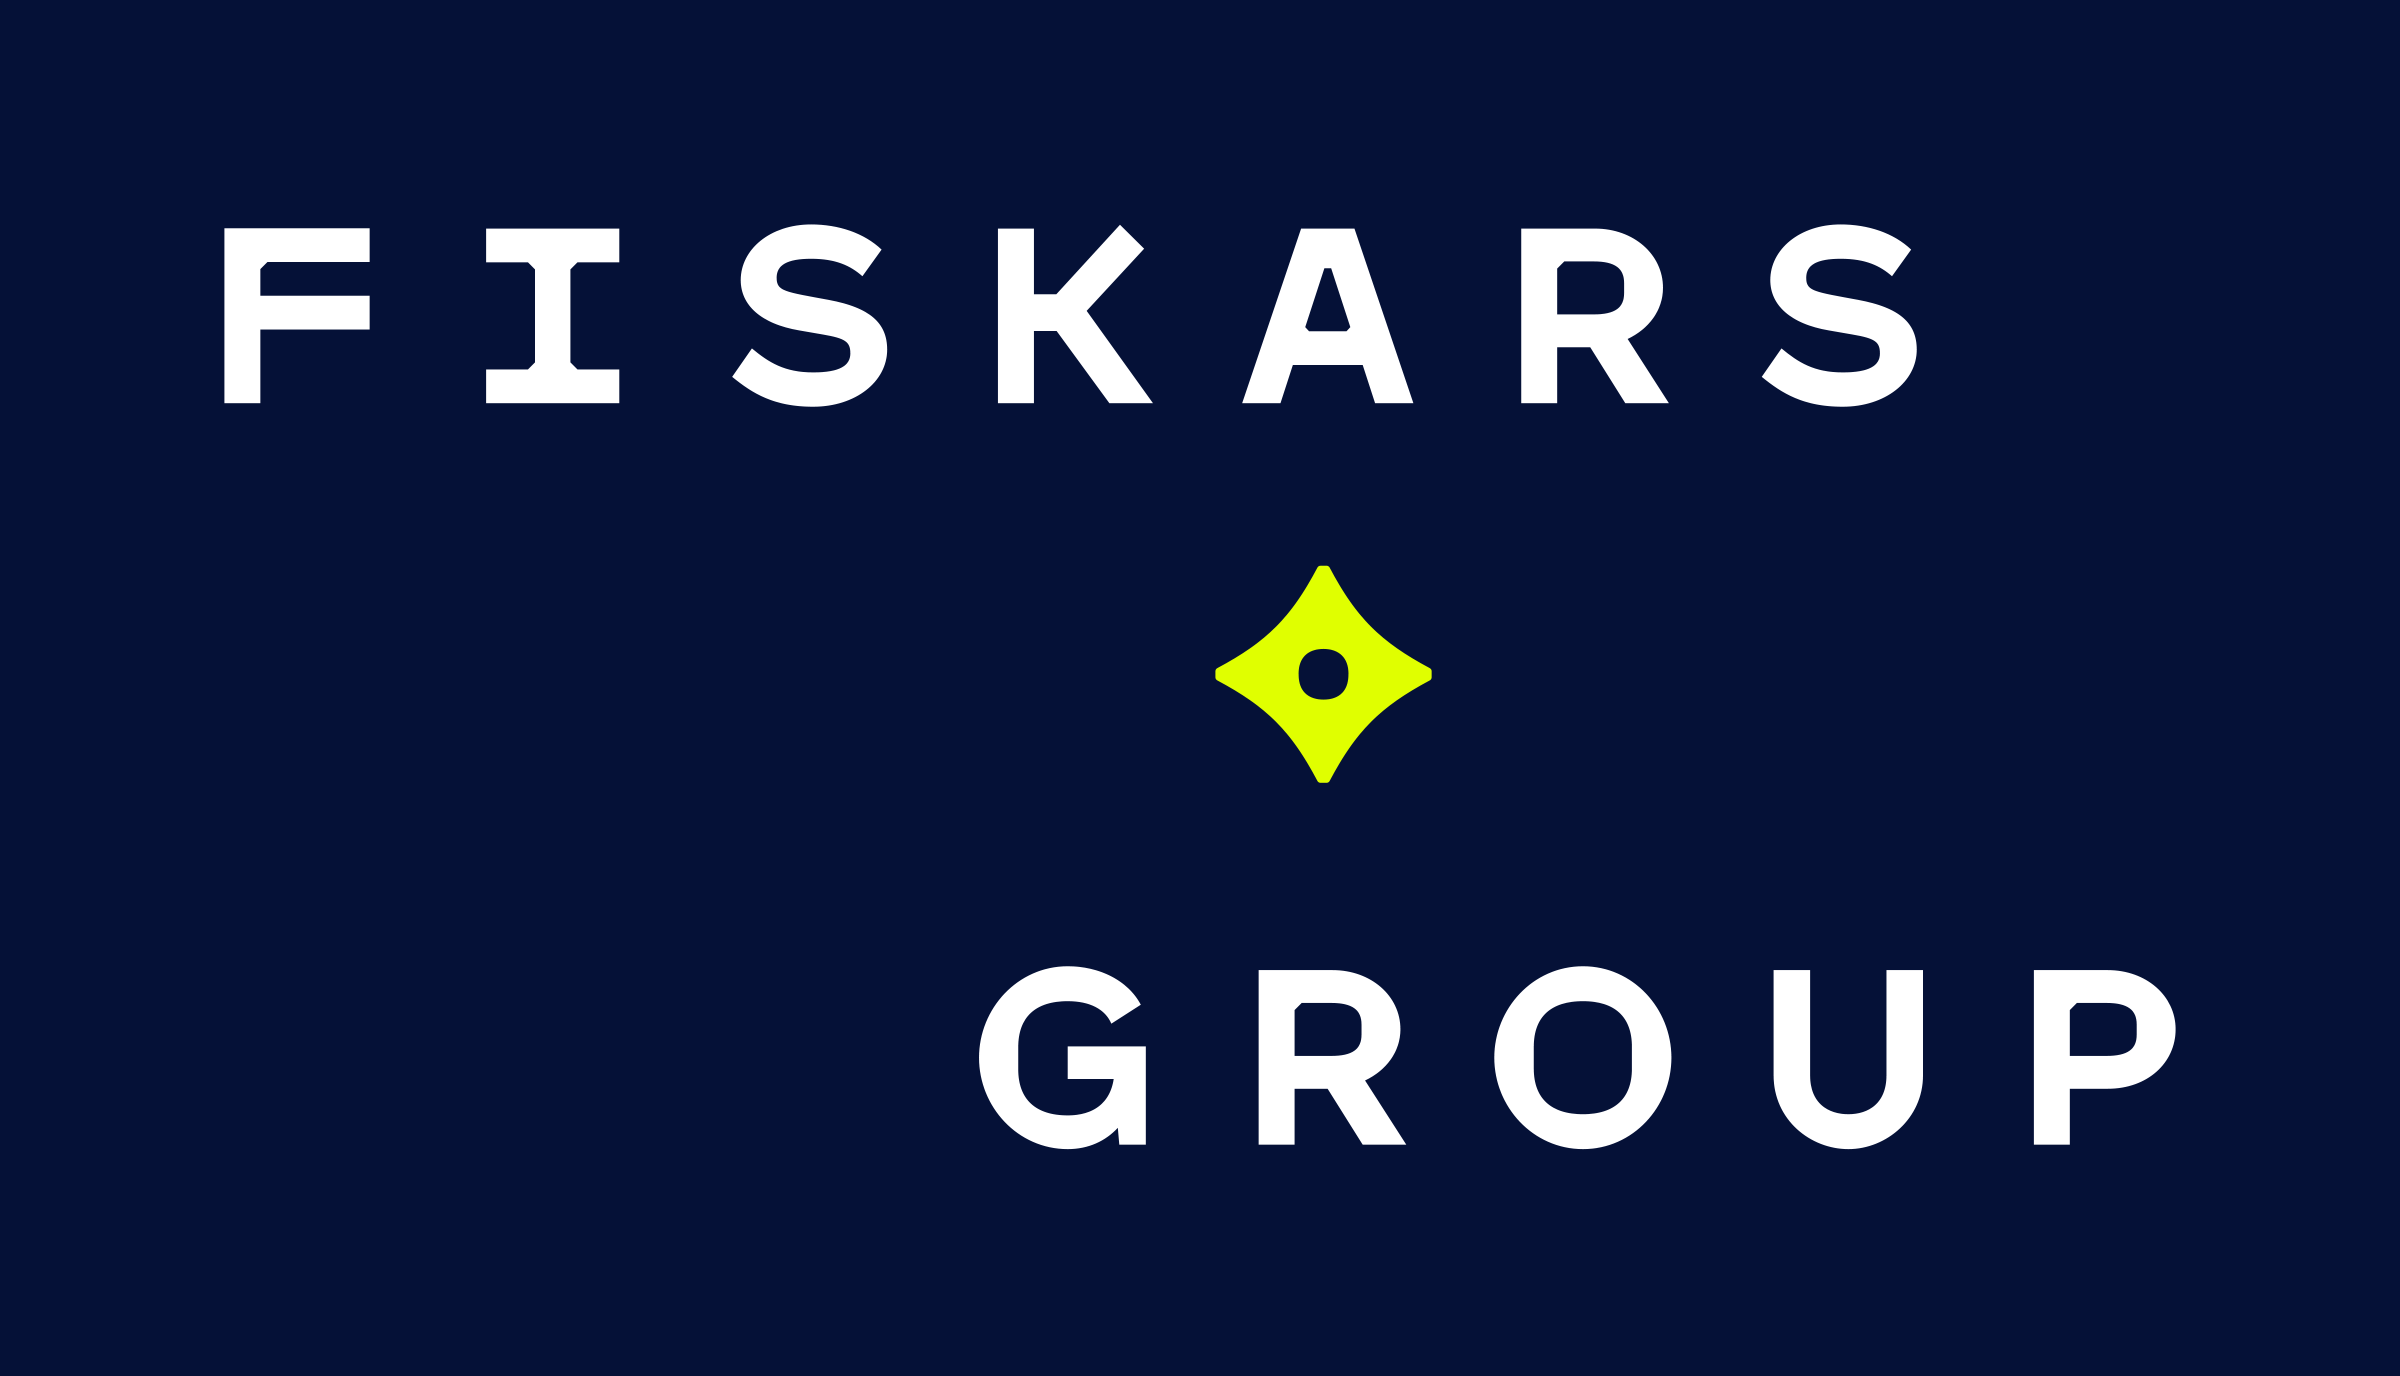 Fiskars Group 启用全新的品牌LOGO和VI形象设计-vi设计4